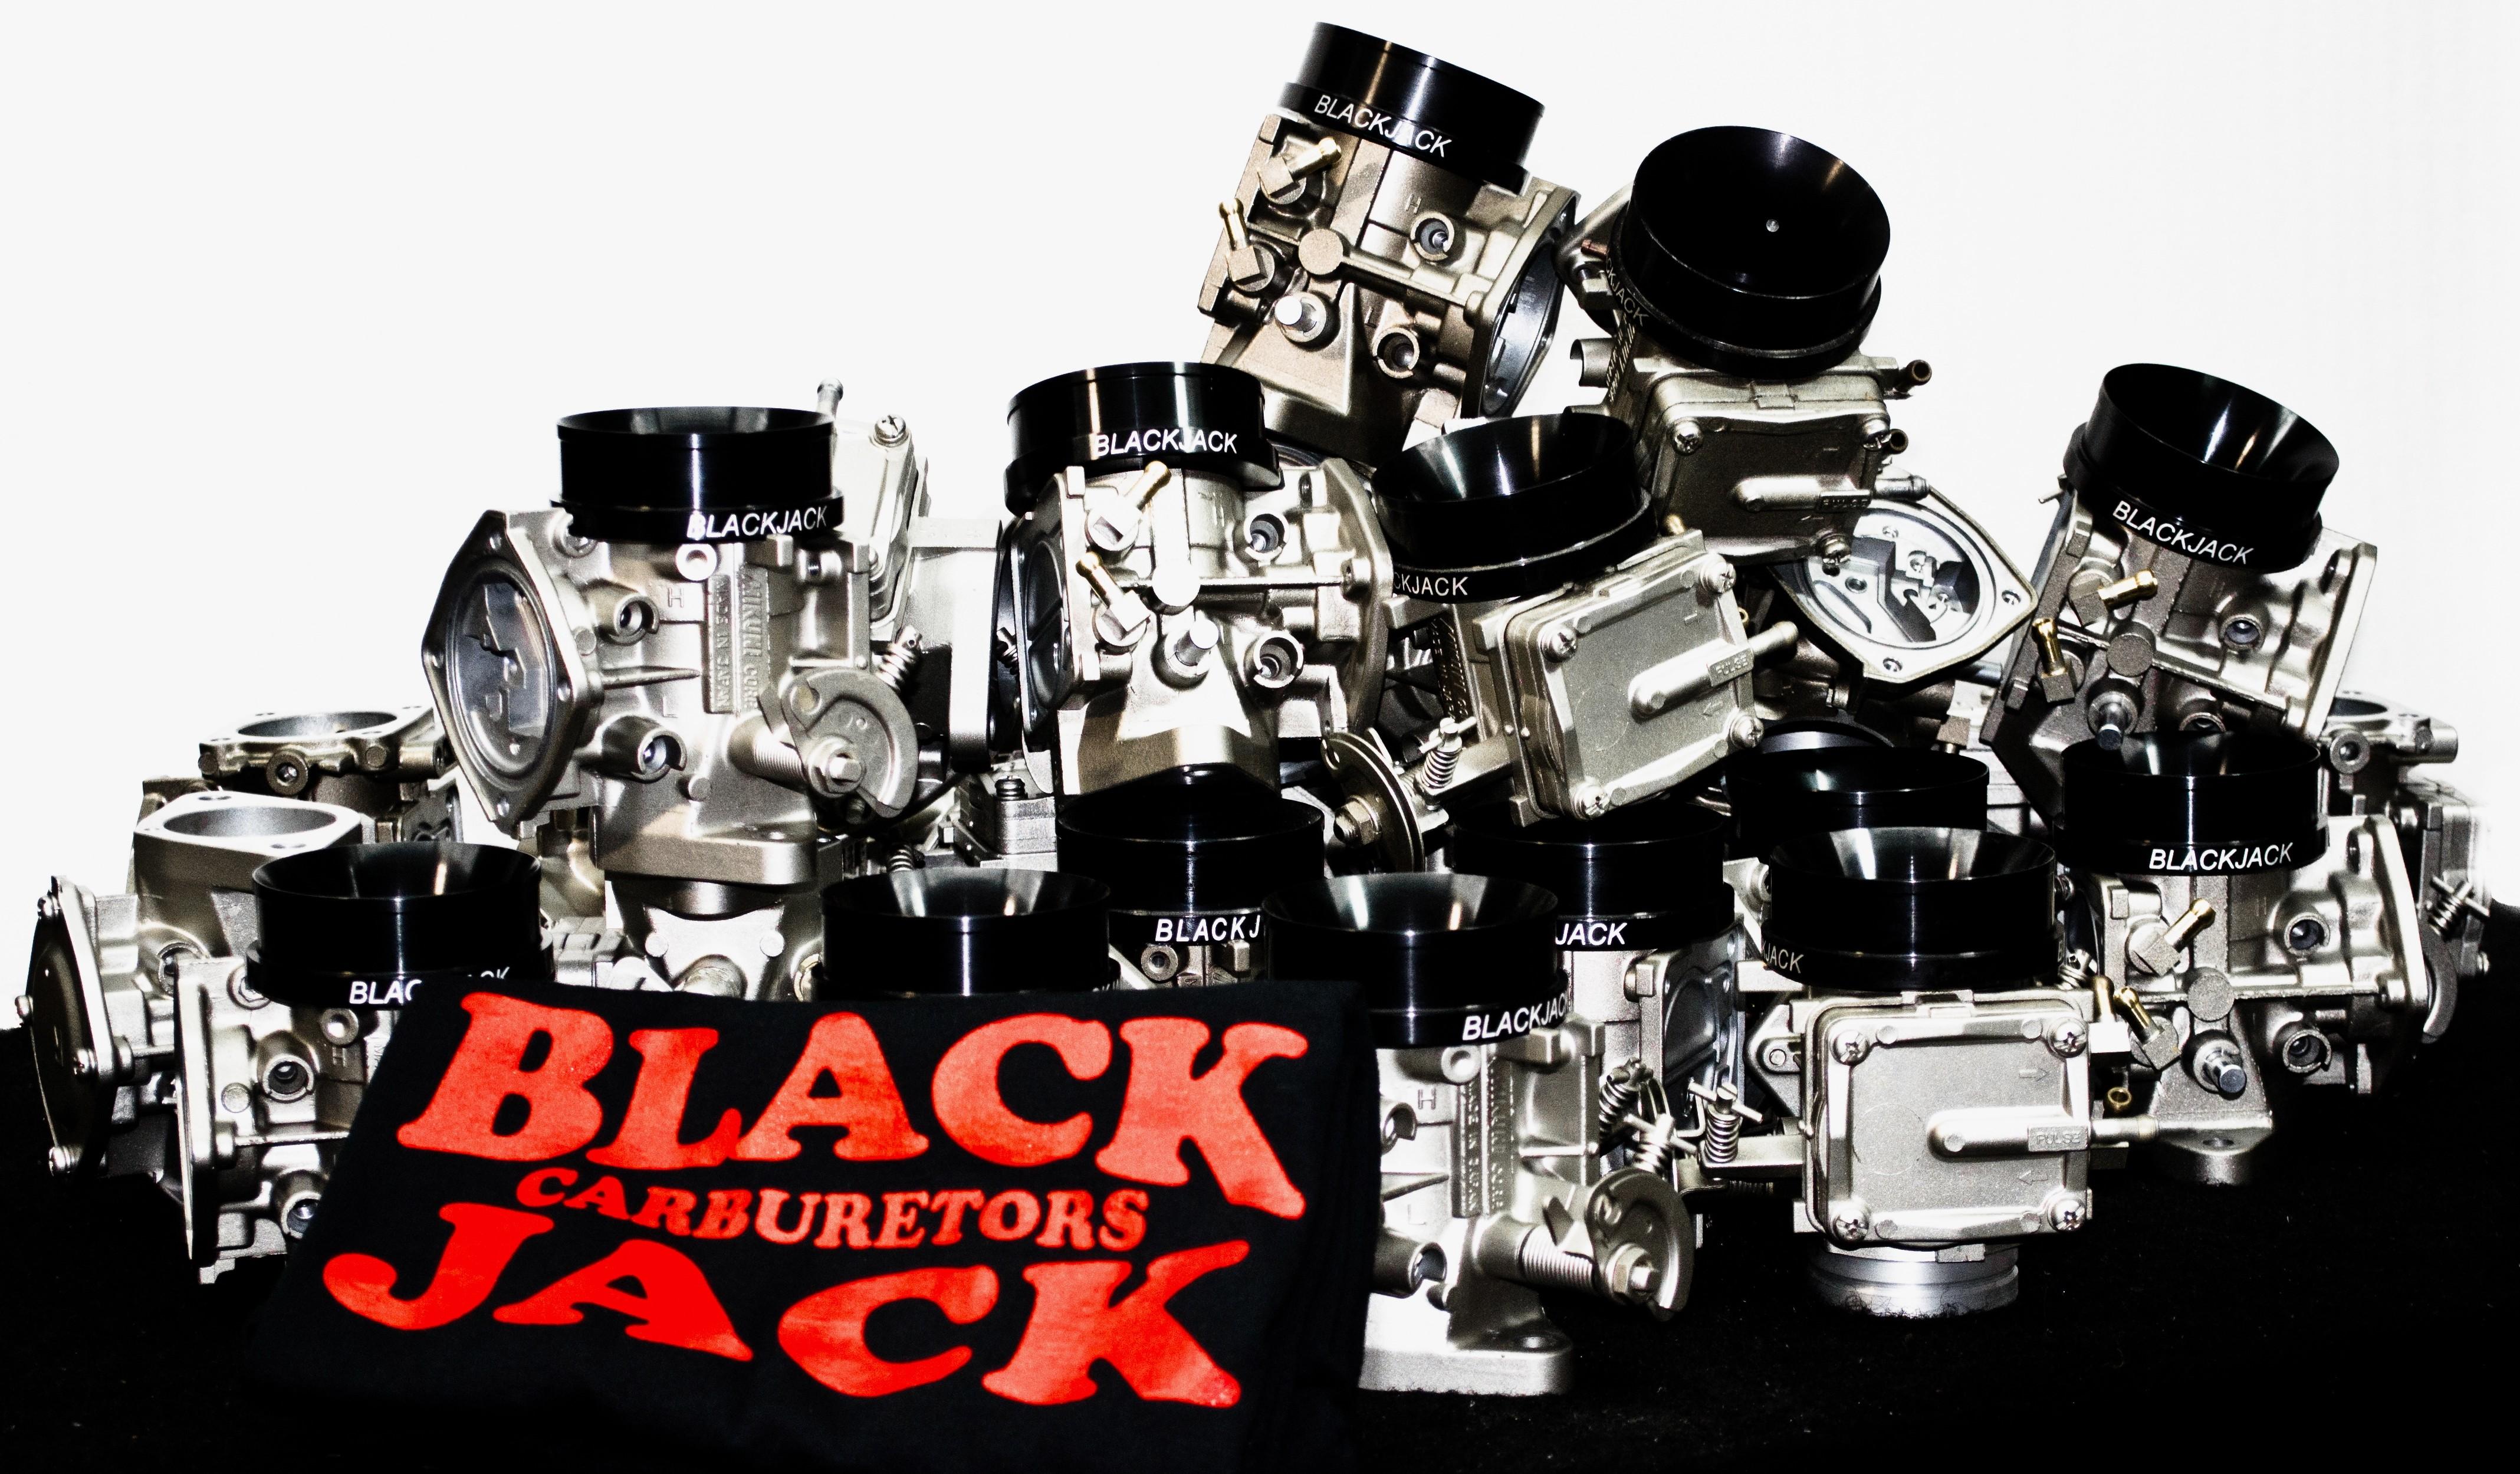 Black Jack Carbs